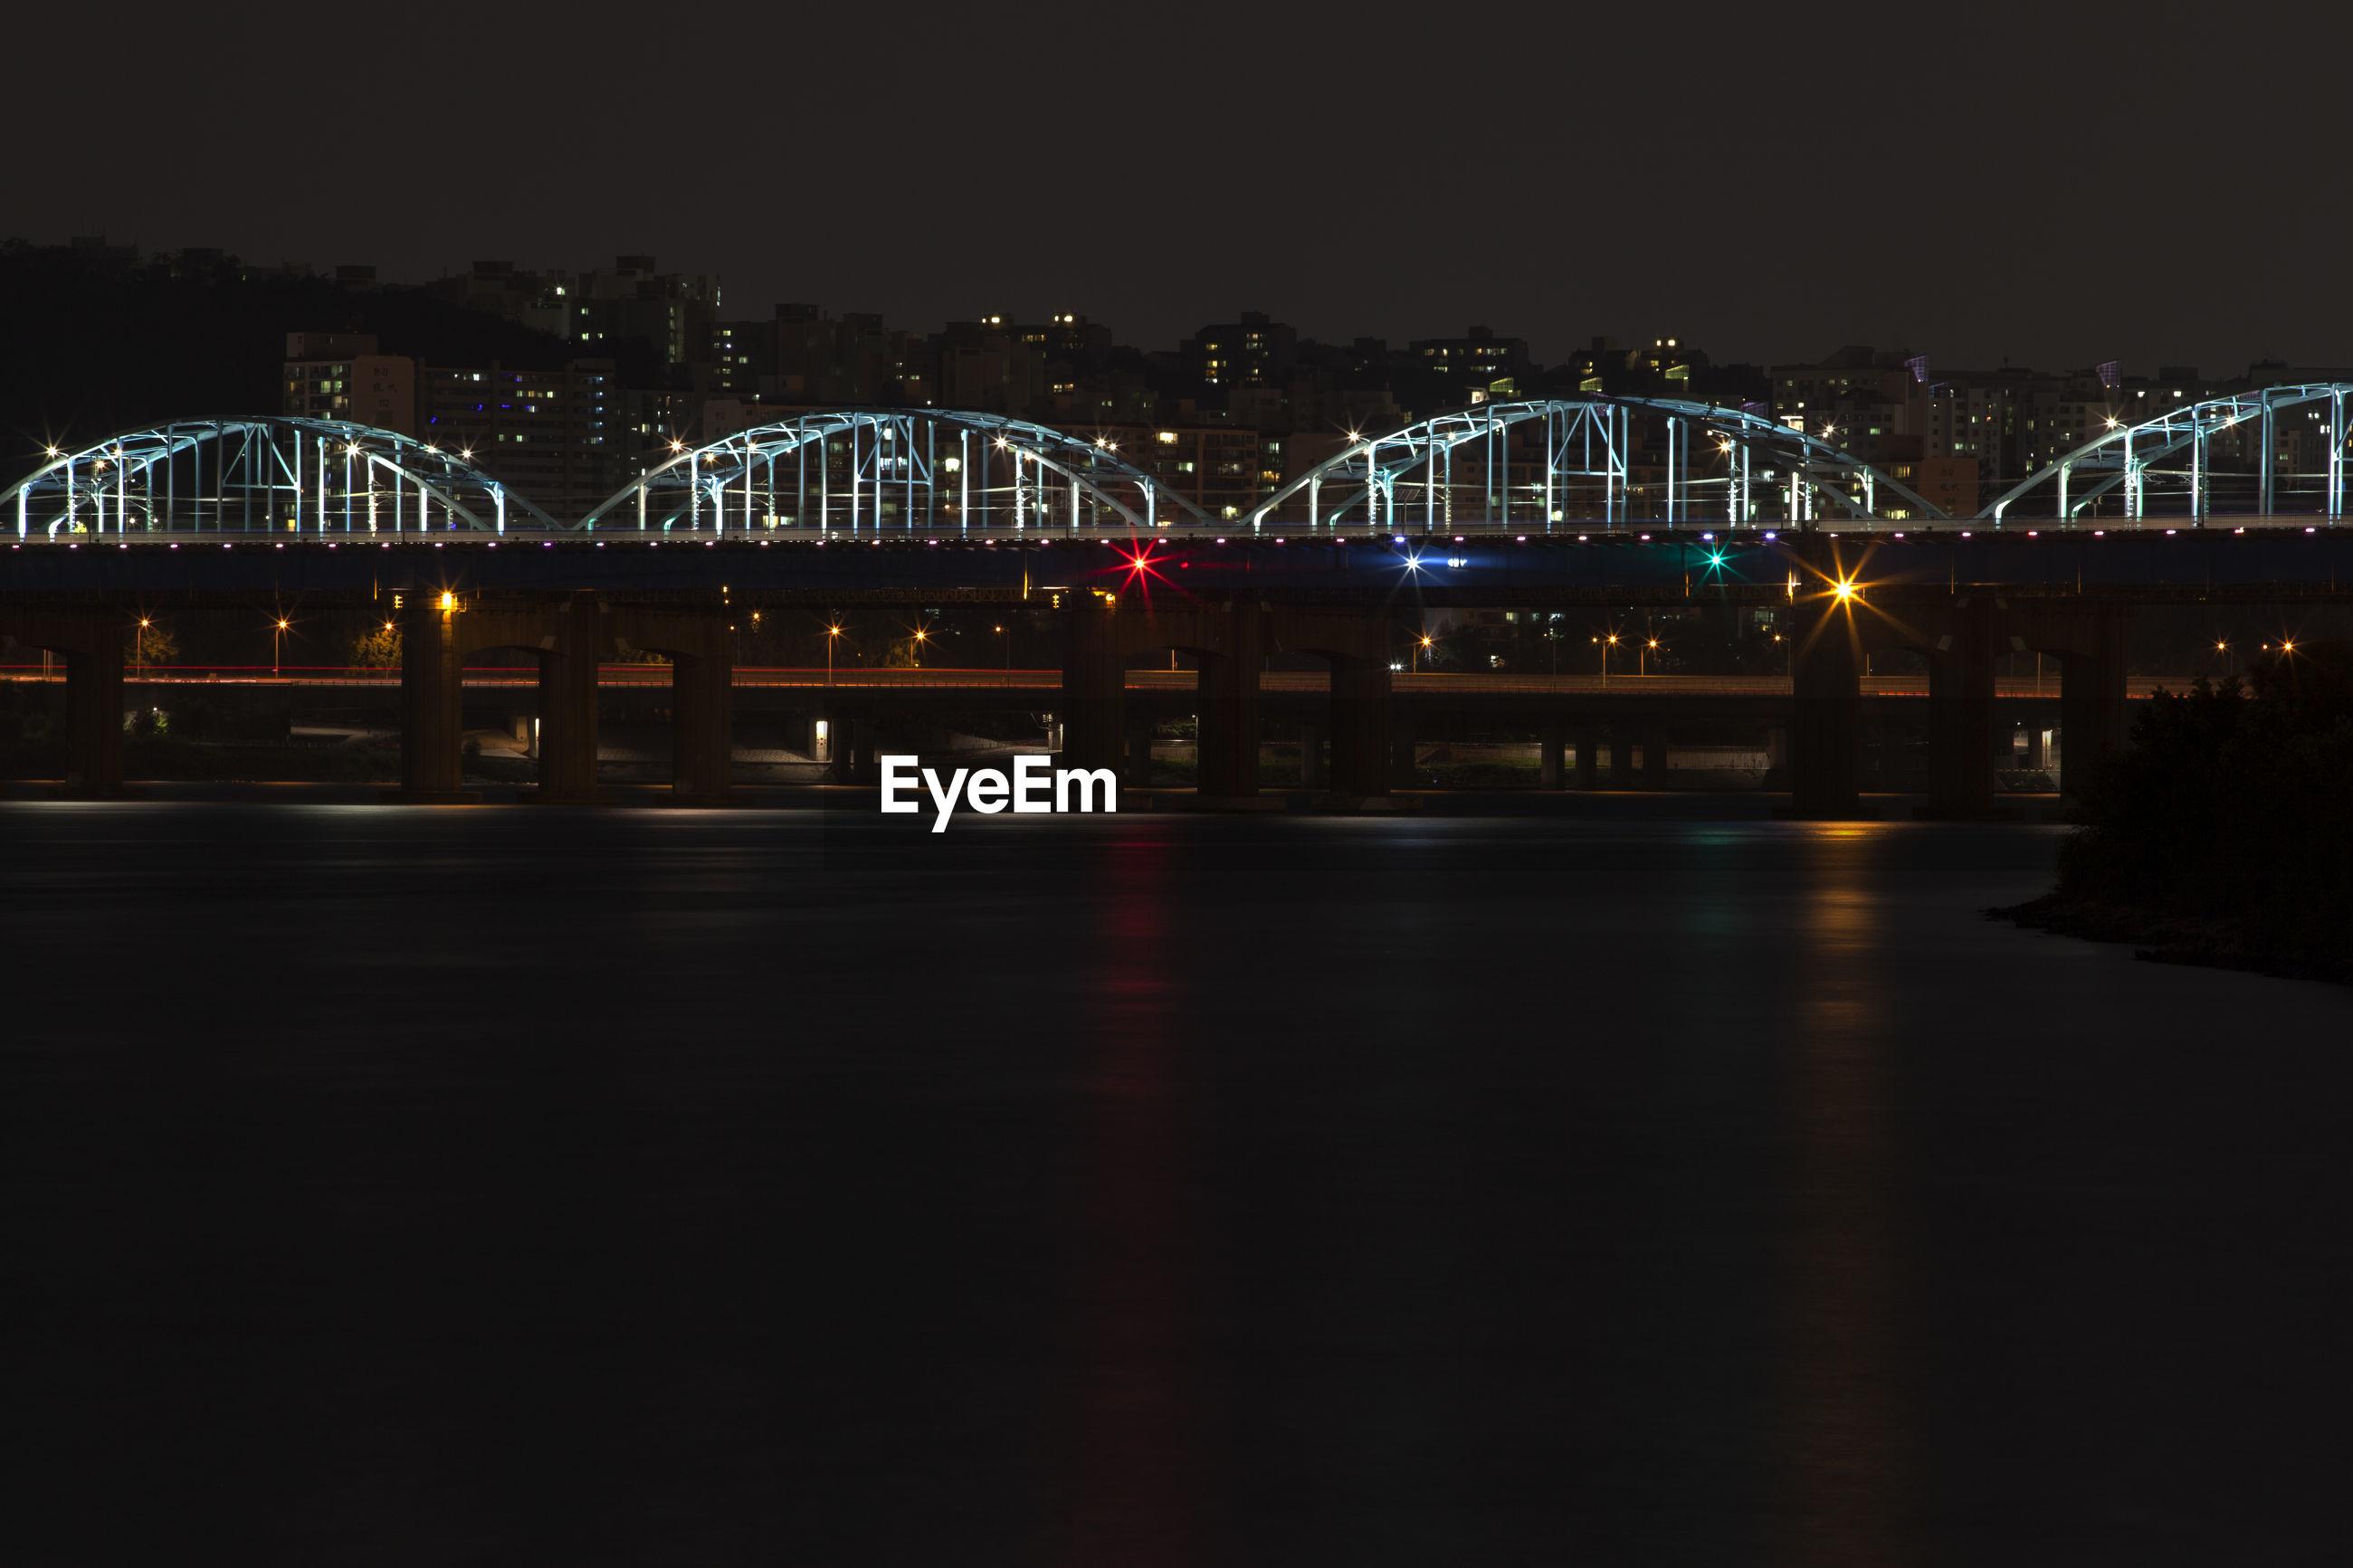 Dongjakdaegyo bridge over han river against sky in city at night